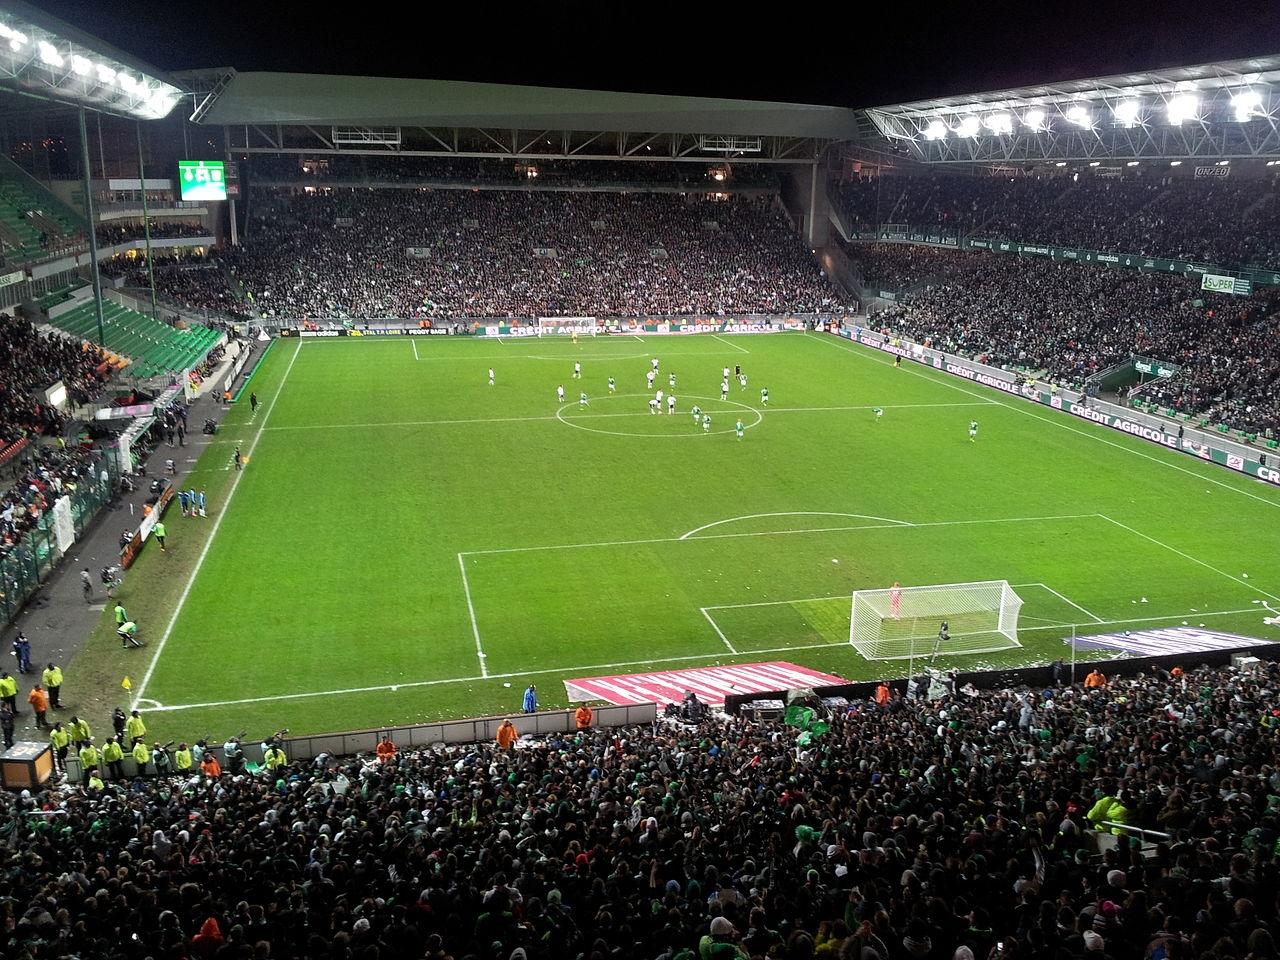 Portugal-Islândia a partir de 125 euros - Renascença c6332f5958722